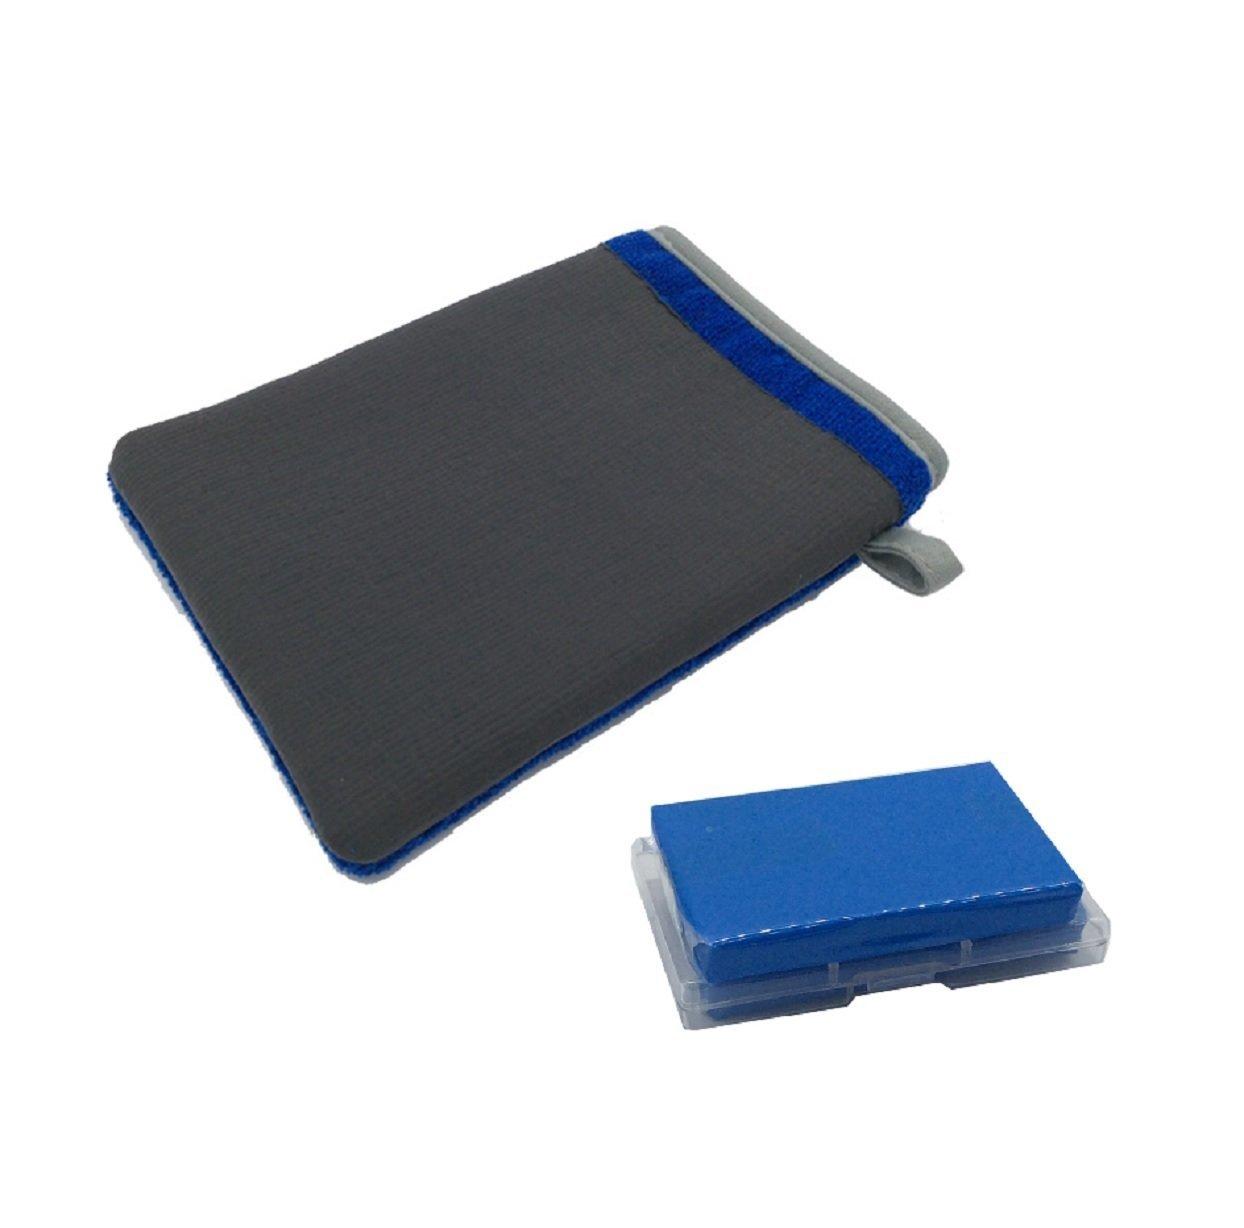 MAARYEE Car Clay Bar 100g Auto Detailing Magic Claybar Cleaner Pack of 4 Blue